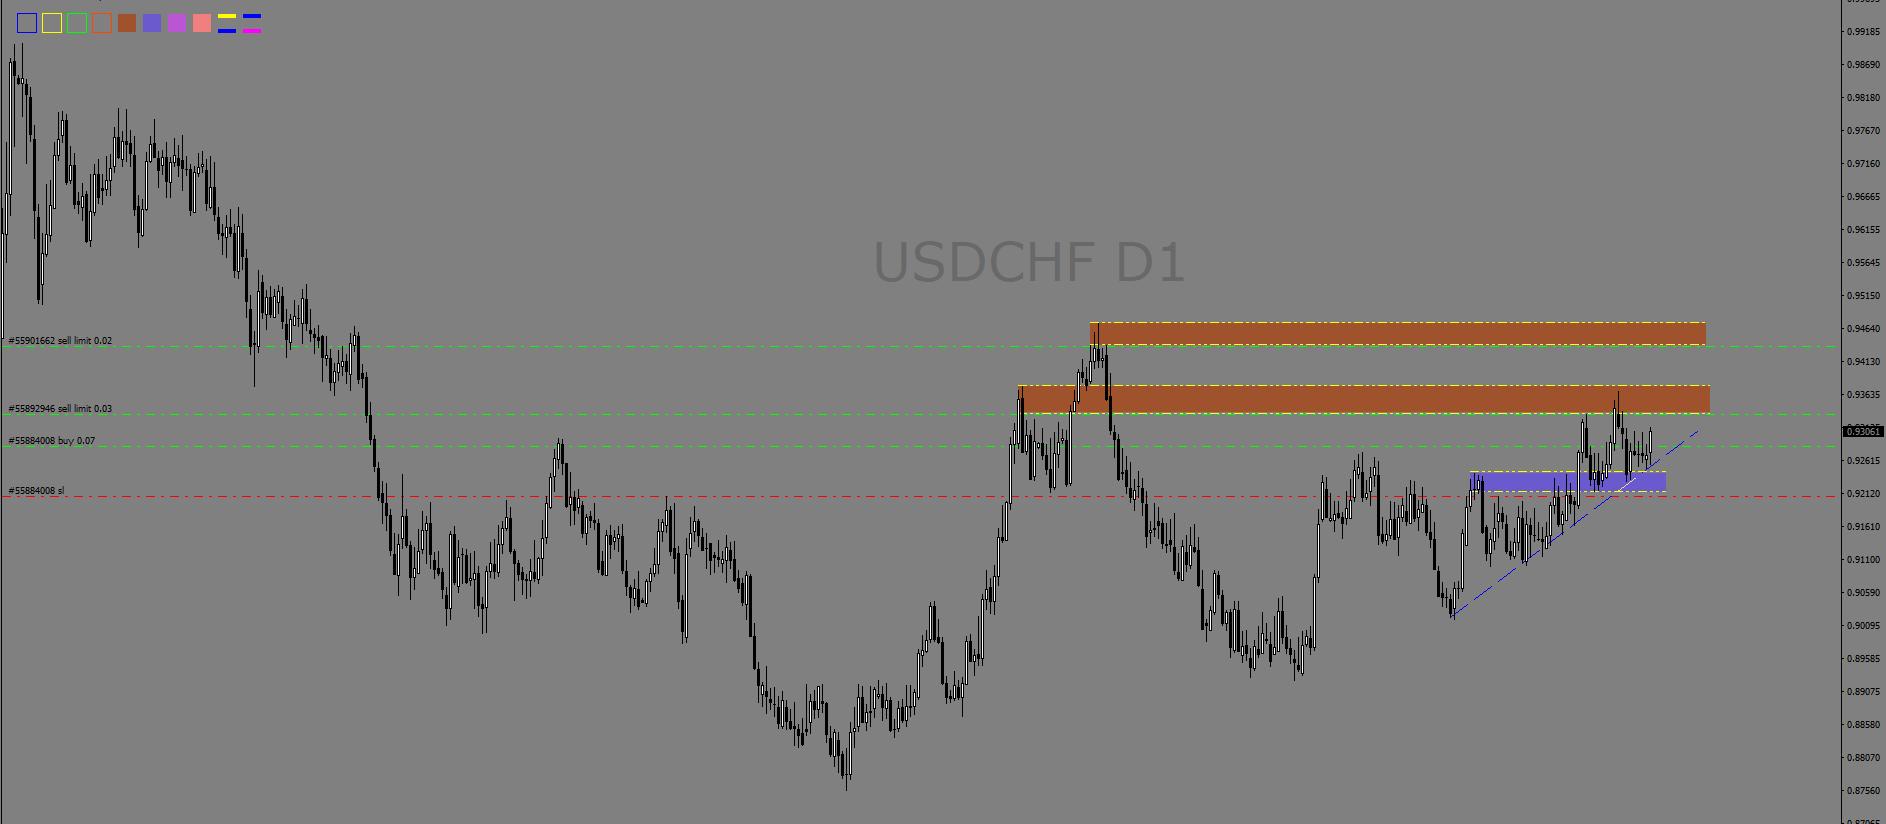 13 Oct - USDCHF - D